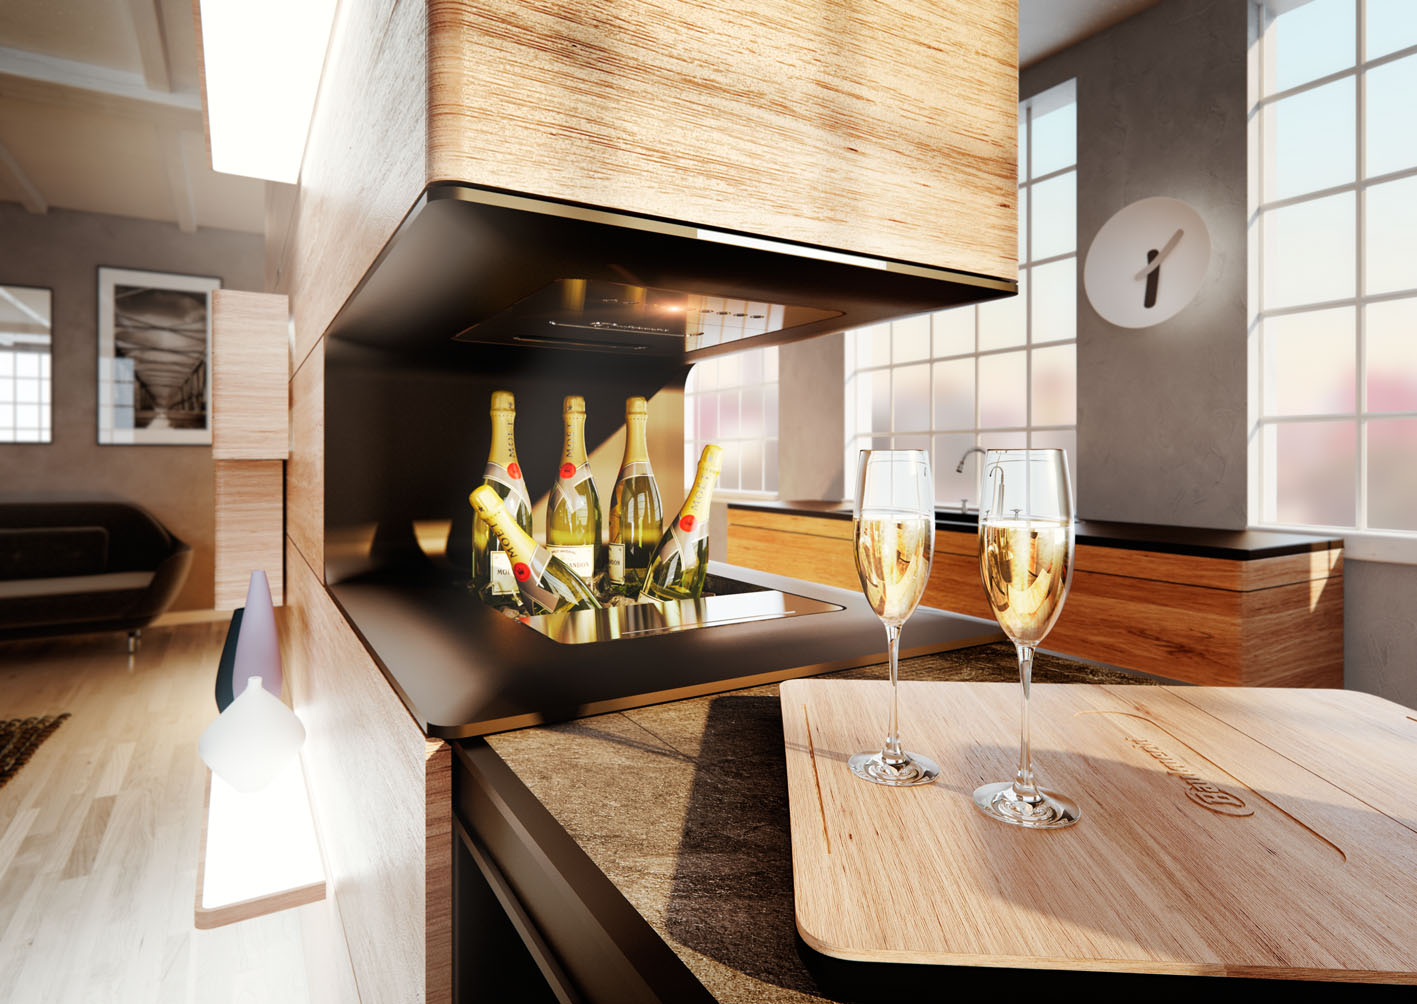 bauknecht hausger te gmbh sm rtspace stuttgart. Black Bedroom Furniture Sets. Home Design Ideas